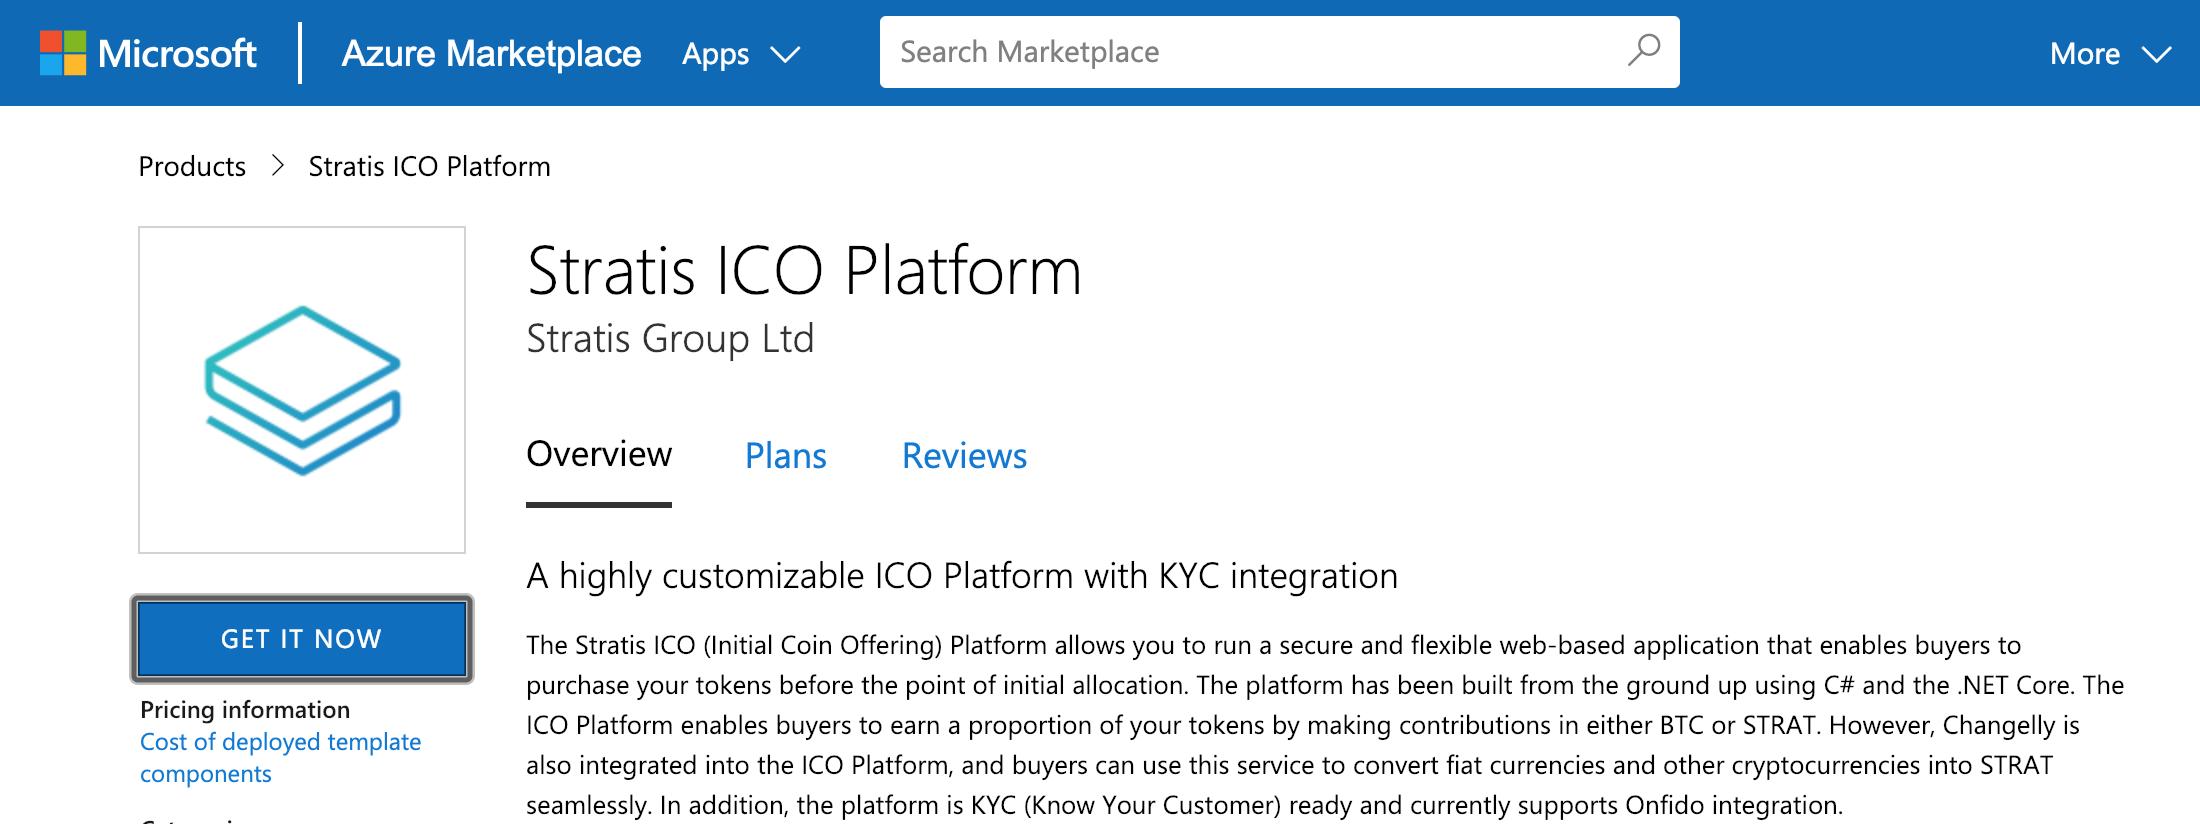 stratis-ico-platform-microsoft